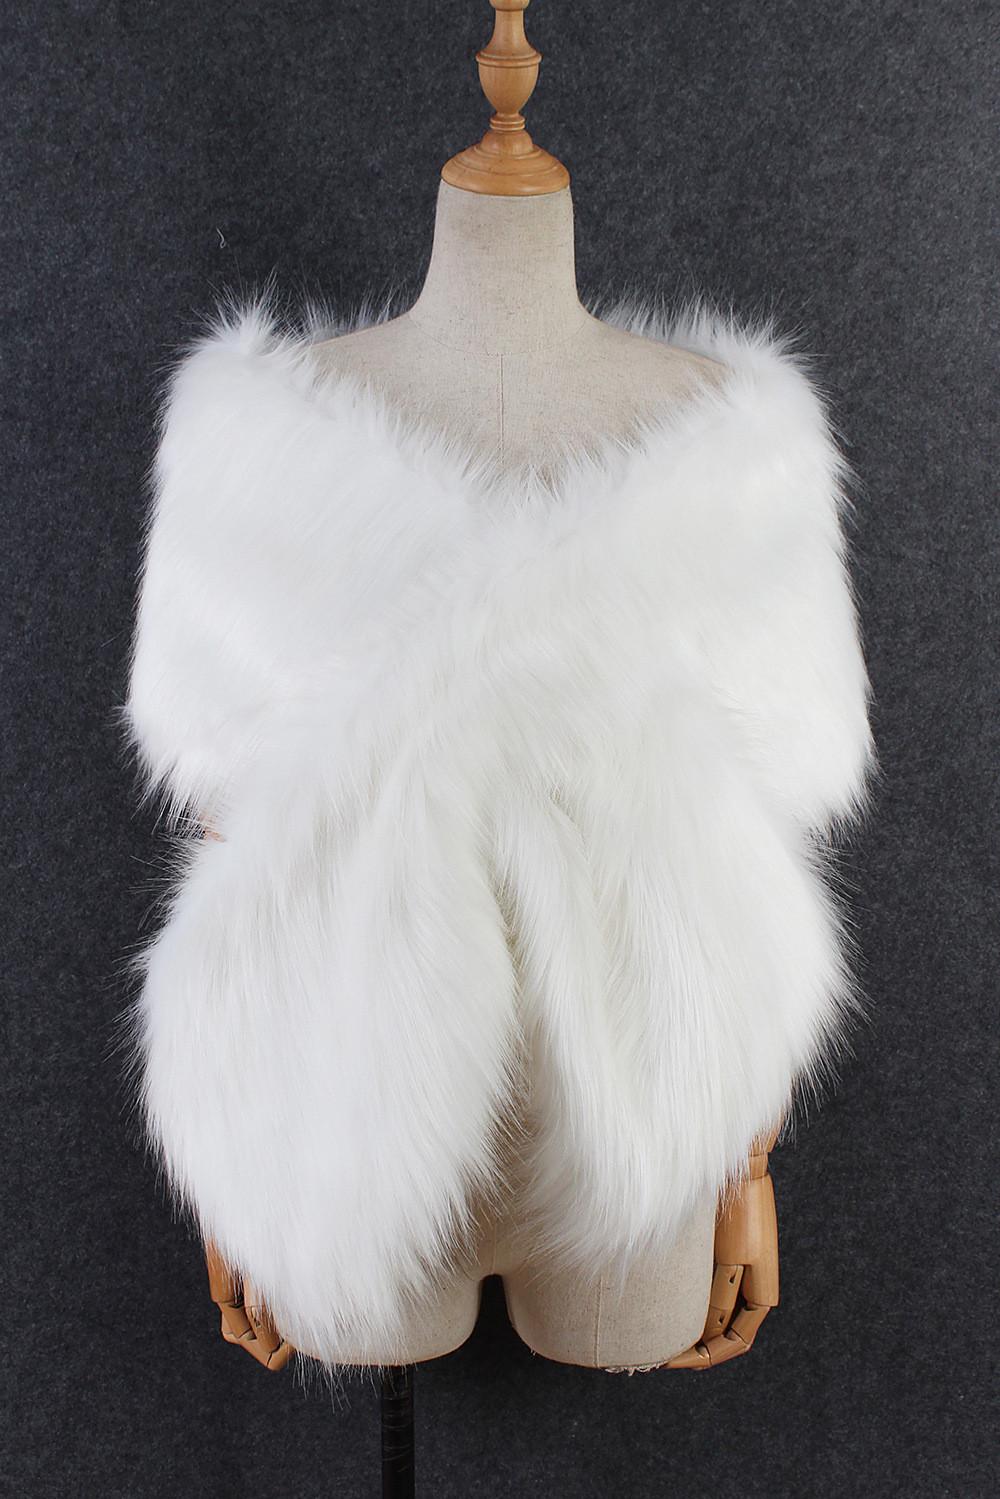 The autumn and winter new imitation fur big cape neck scarf multi-color joker scarf bride dress cross cape (21)